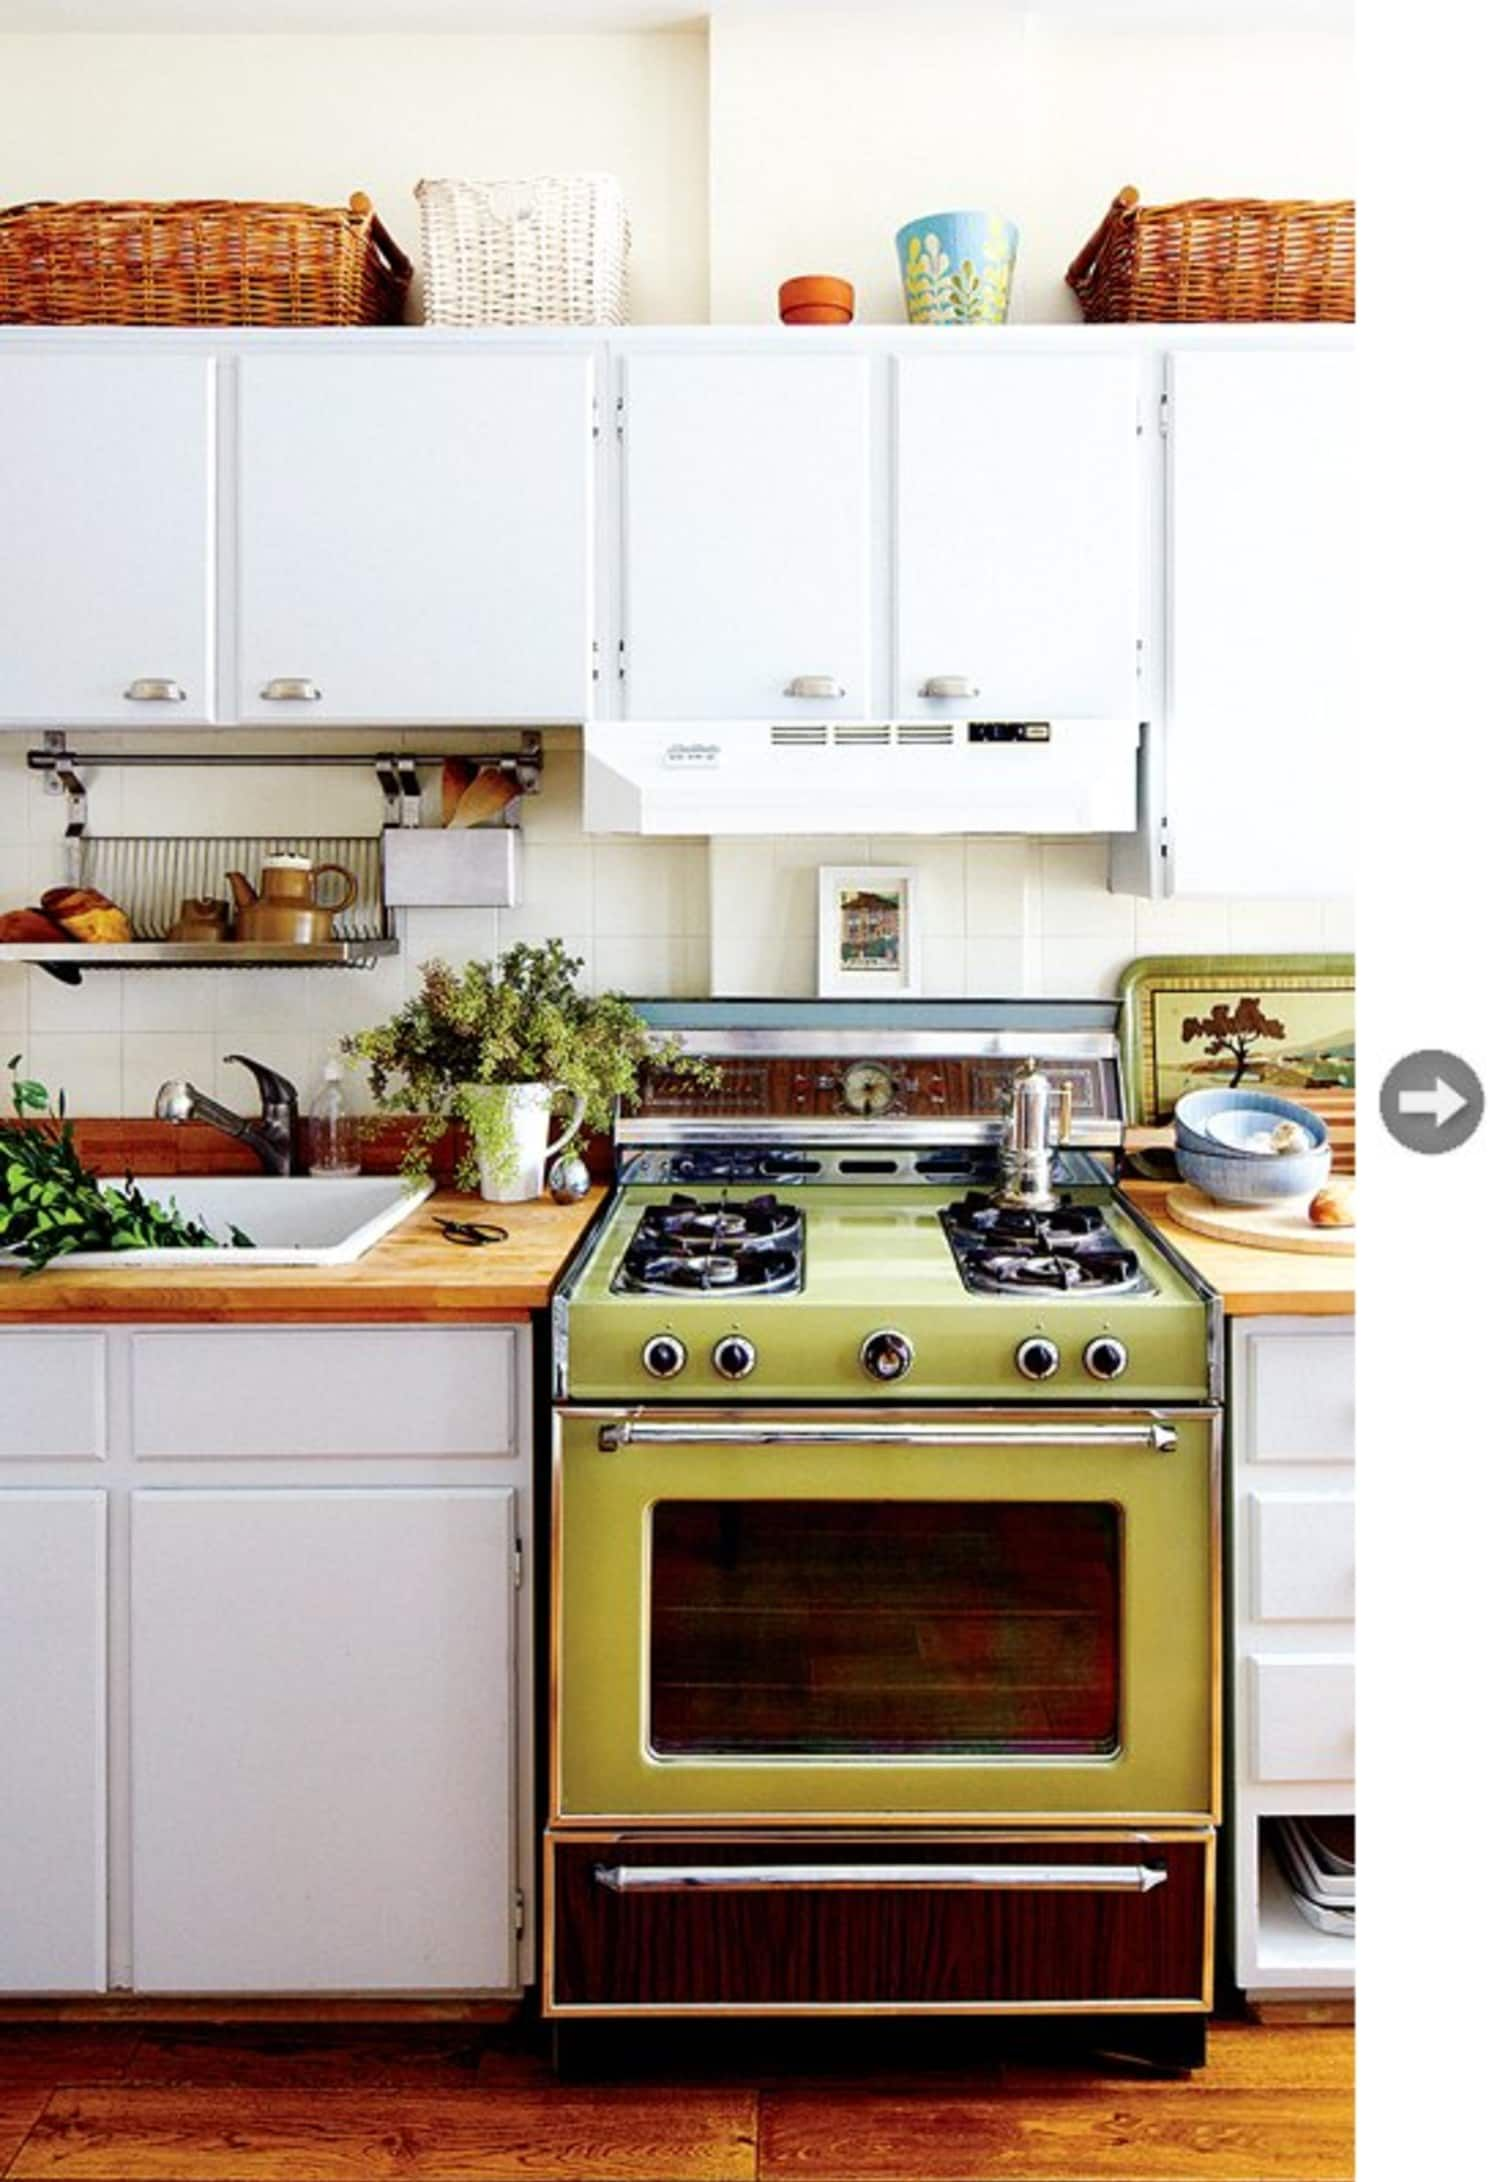 Stylish Kitchens Rocking 1970s Avocado Green Appliances ...